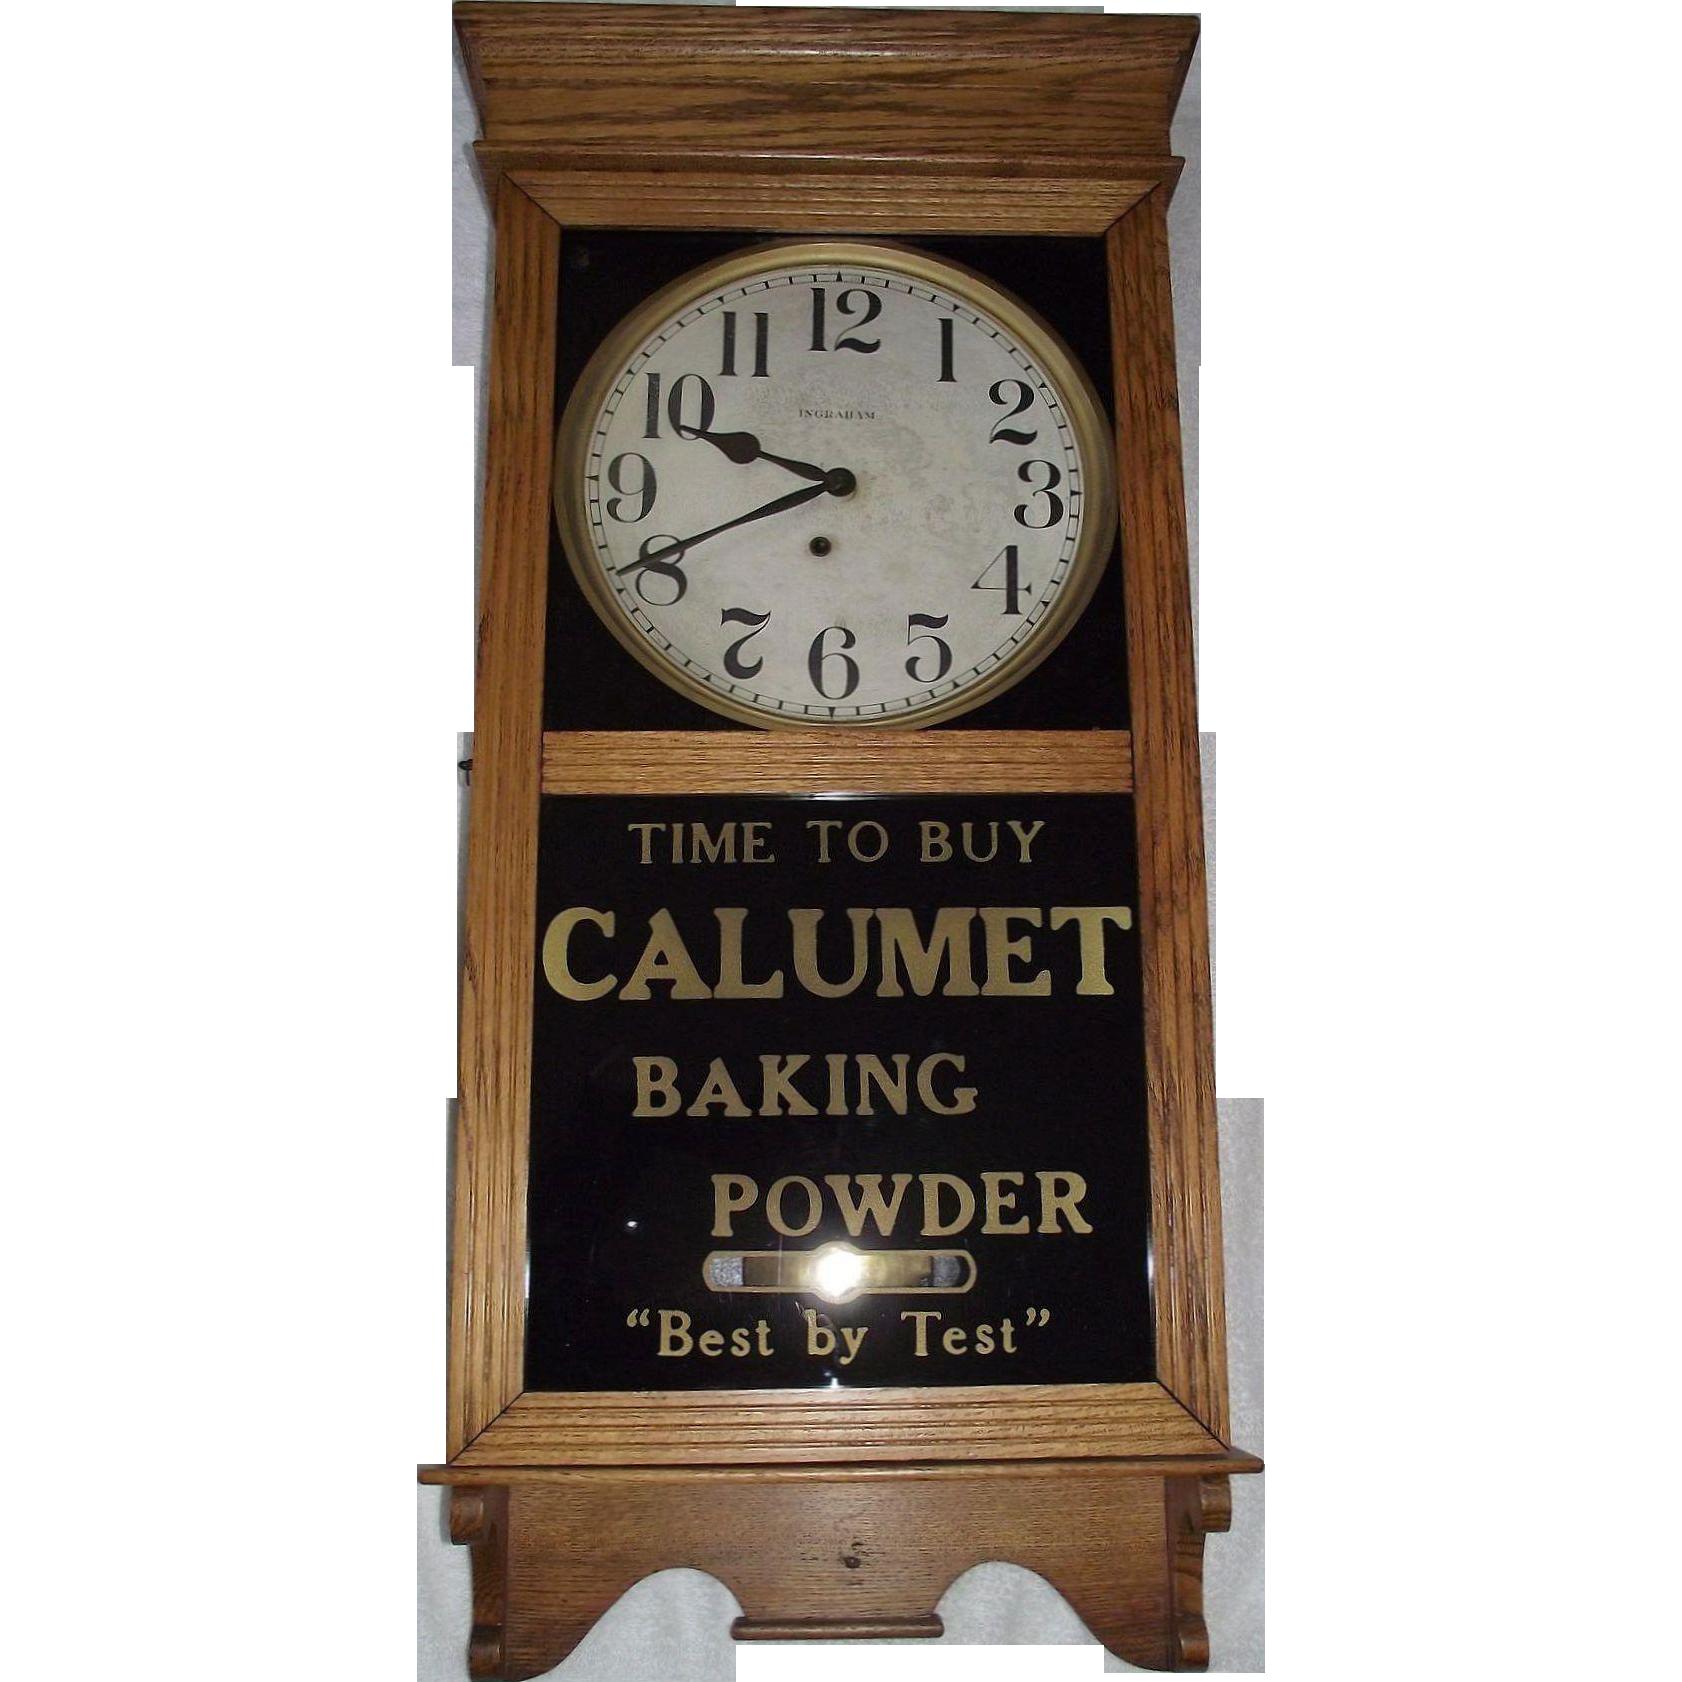 "Advertising Store Regulator Clock marked ""Calumet Baking Powder"" made by E. Ingraham Clock Co.  Circa 1925 !!!"